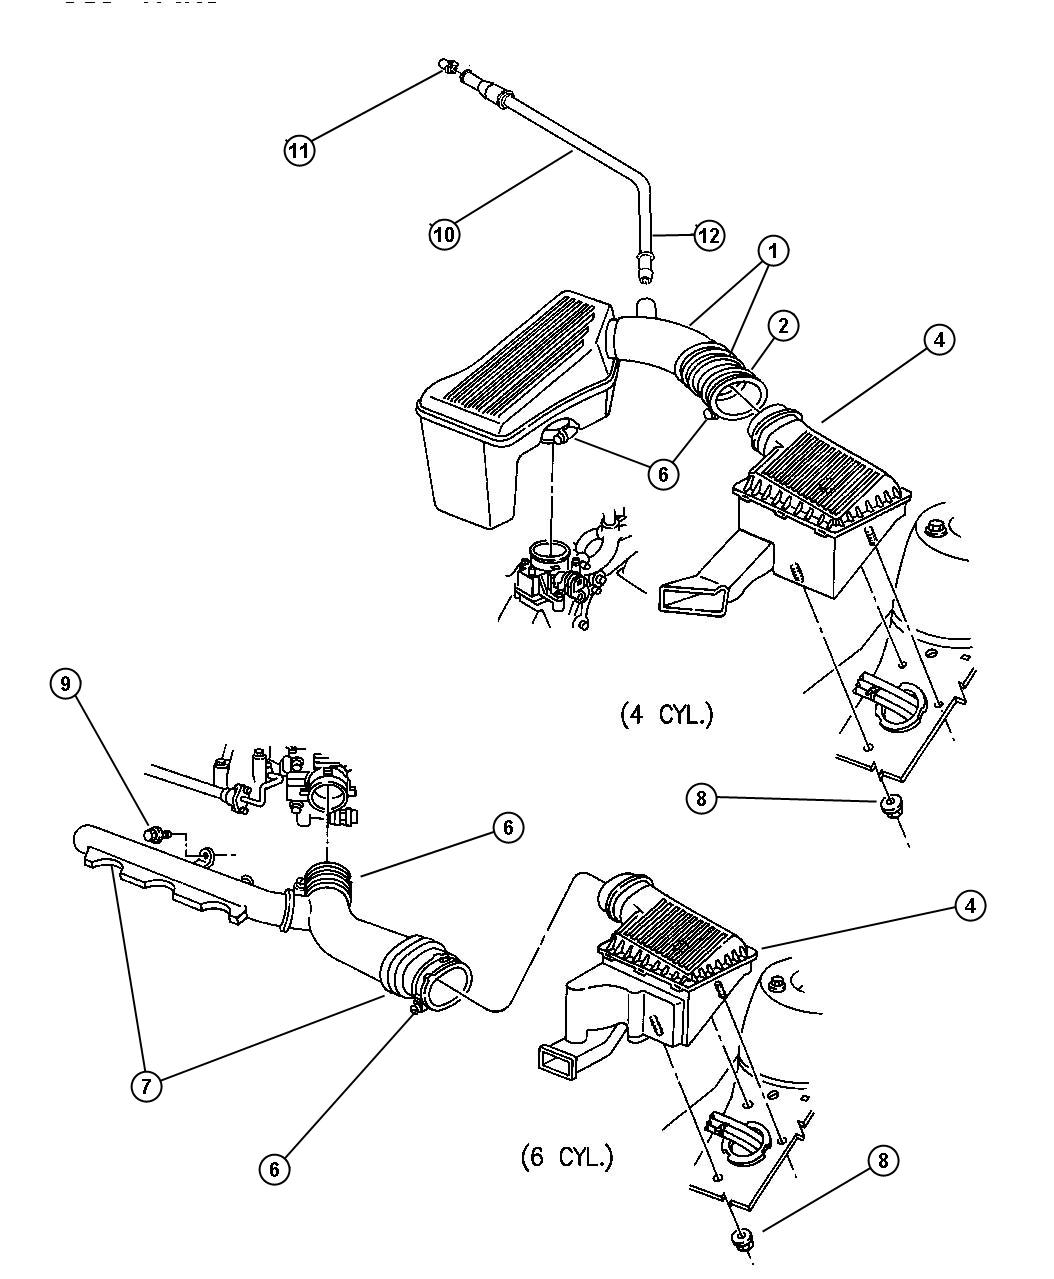 Dodge Stratus Element. Air cleaner. Engine, filter